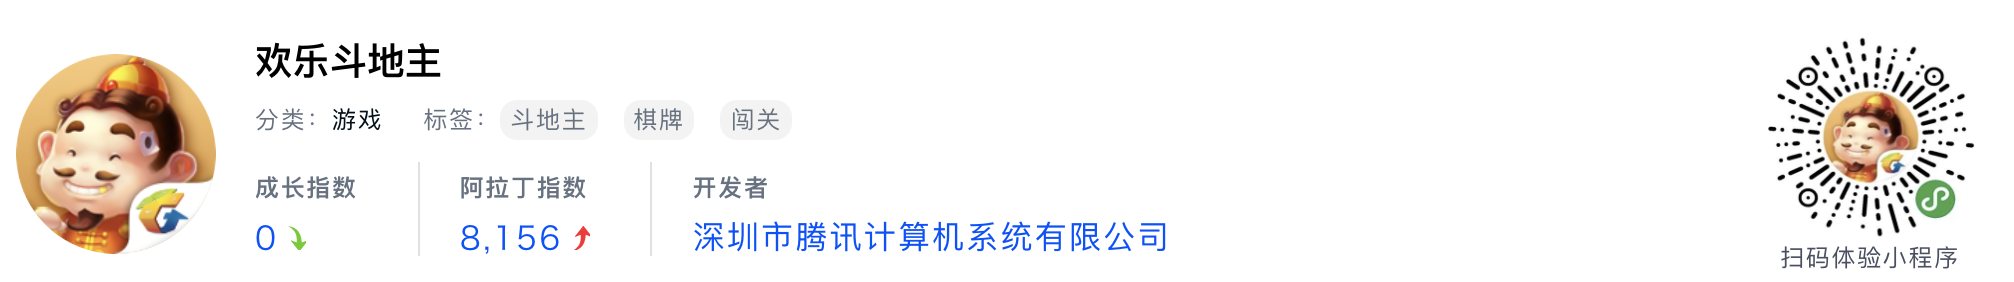 WeChatミニプログラム最新ランキングTOP20【2019年6月版】13位 :欢乐斗地主